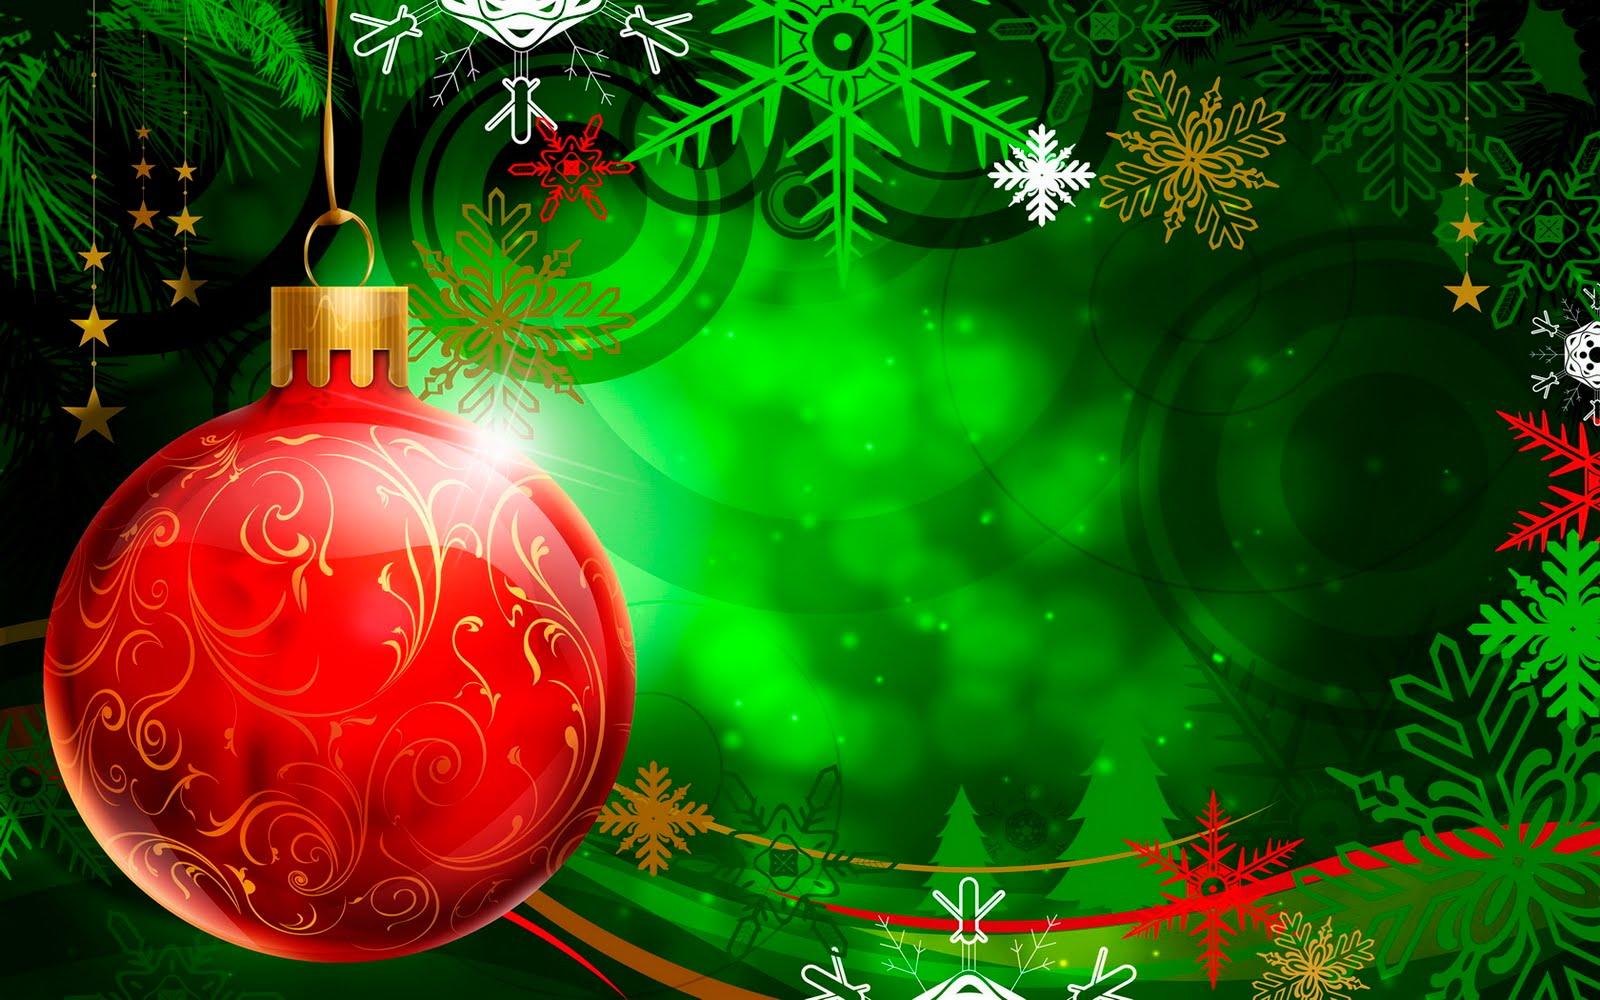 pic new posts wallpaper 25 december